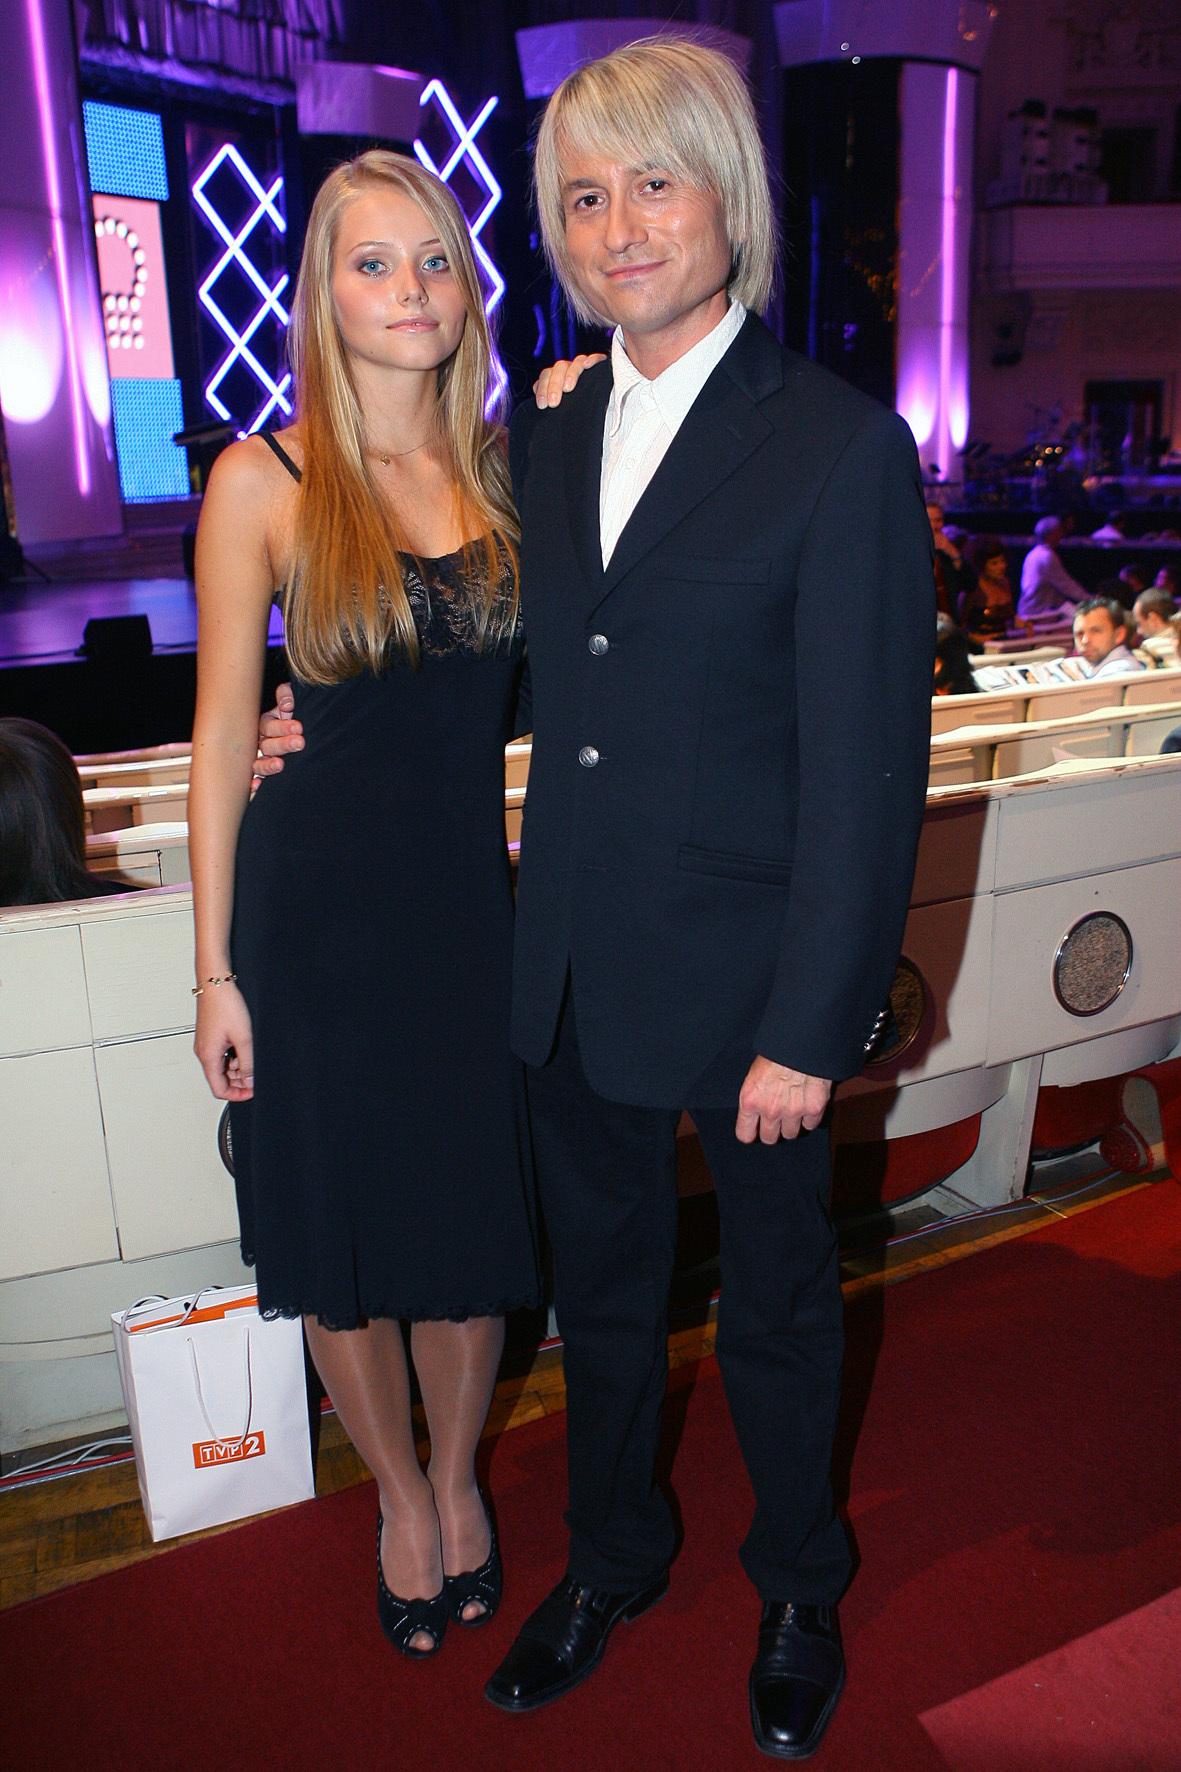 Agata i Piotr Rubik na starym zdjęciu